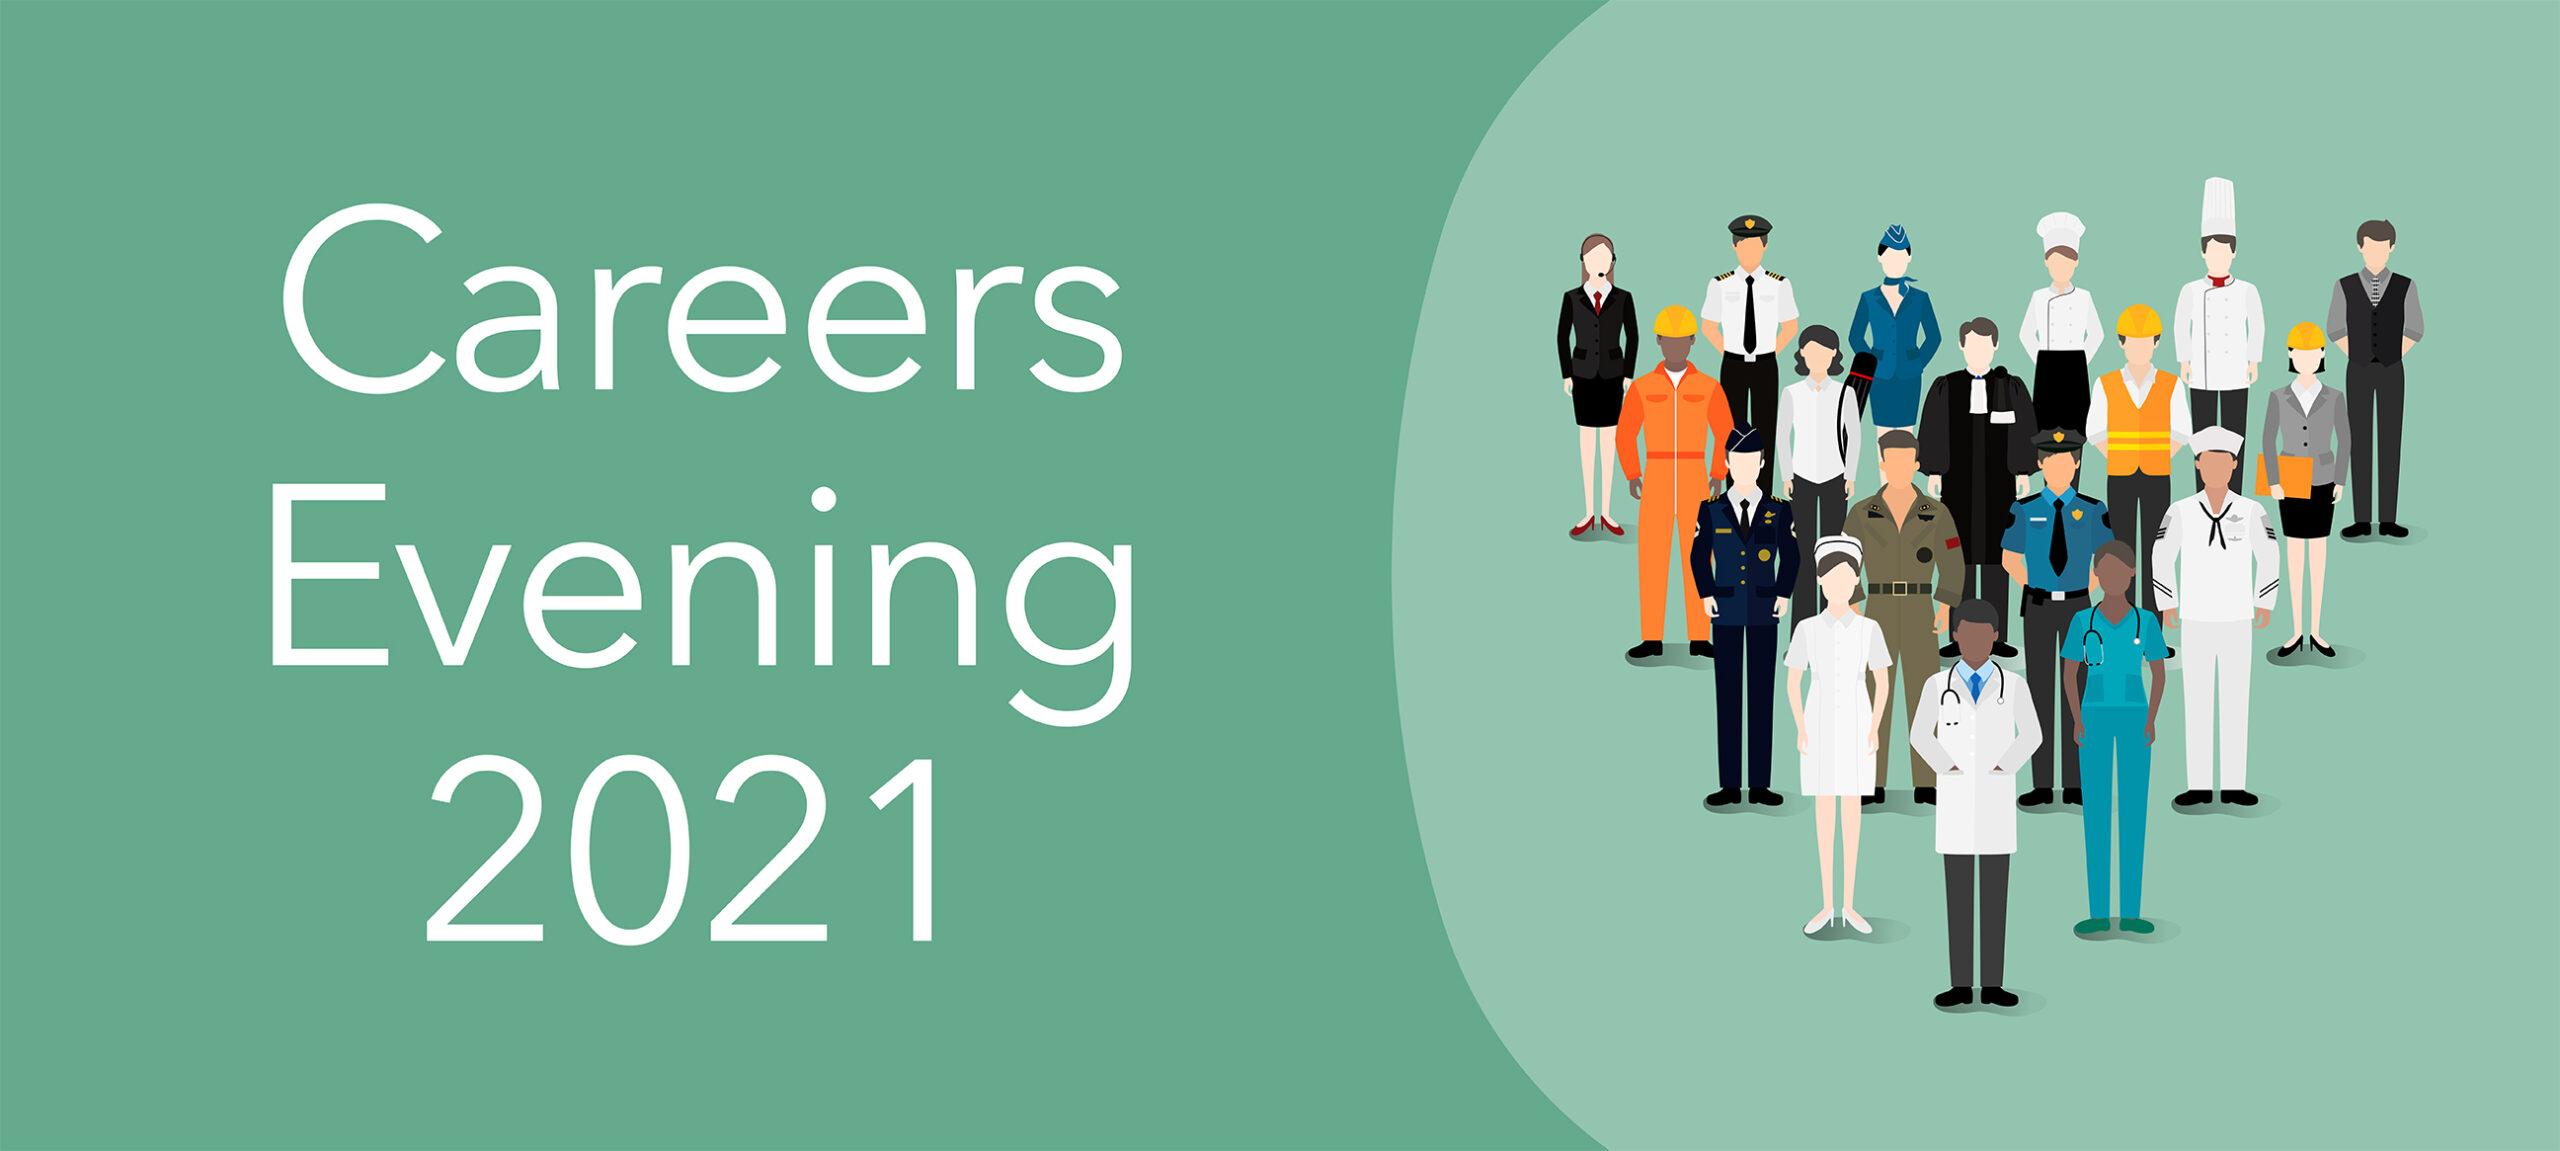 Careers Evening 2021